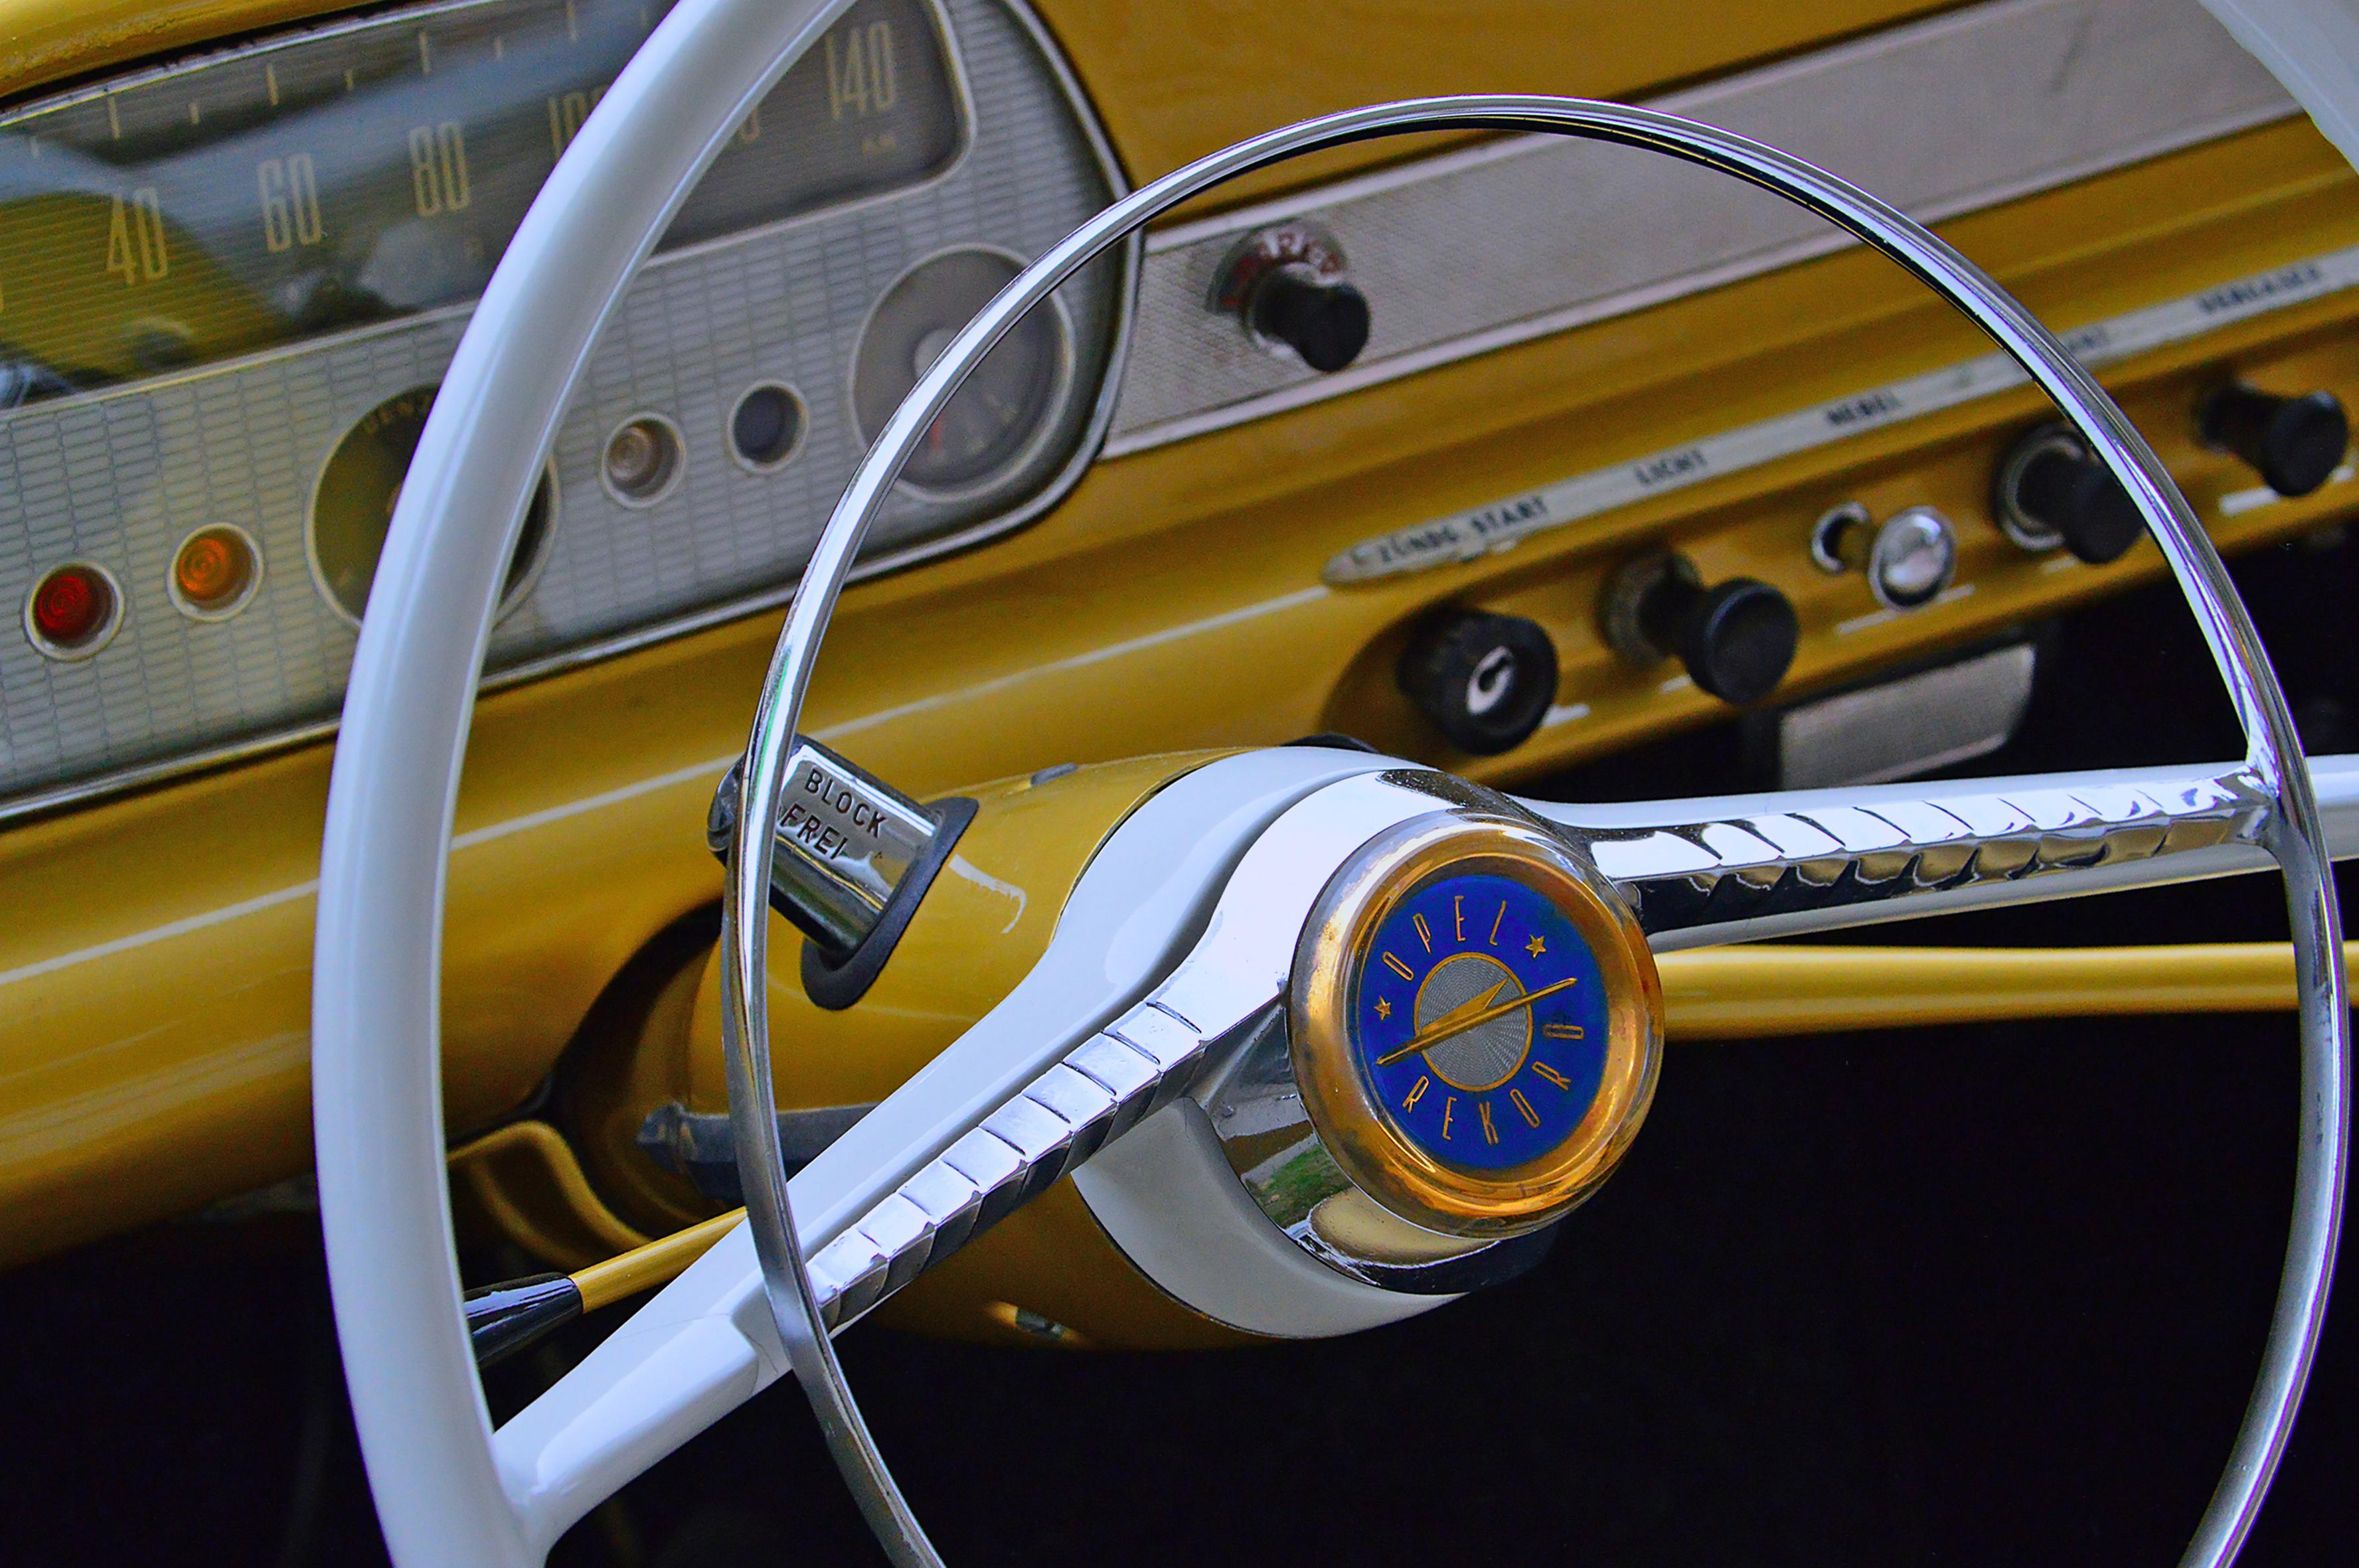 Free Images Classic Old Cars Retro Interior White Transport